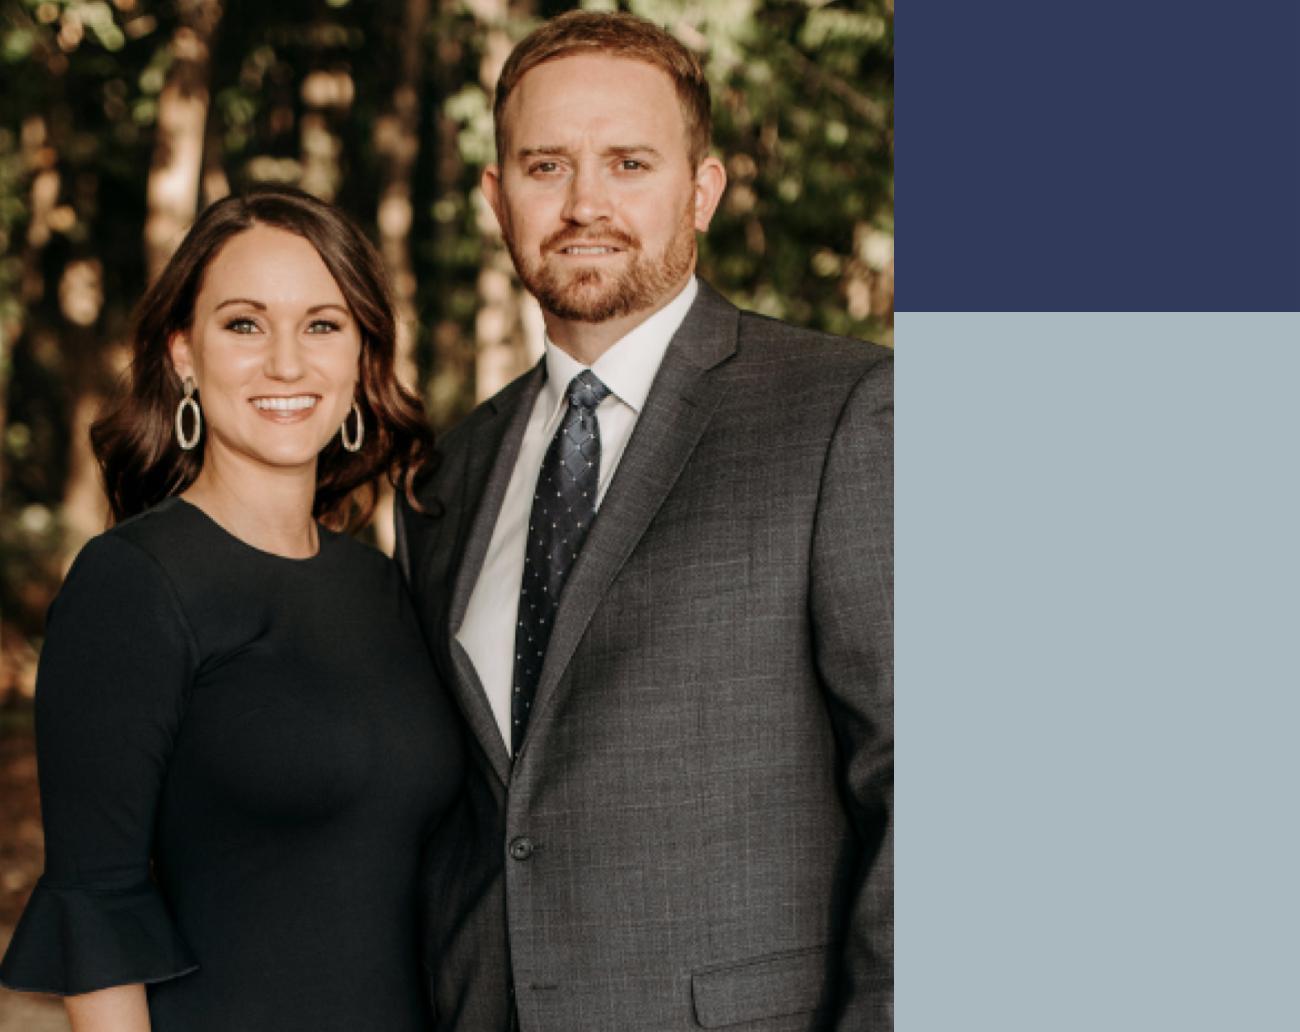 Josh & Charlene Dearing, real estate agents in Charlotte North Carolina who use Ribbon